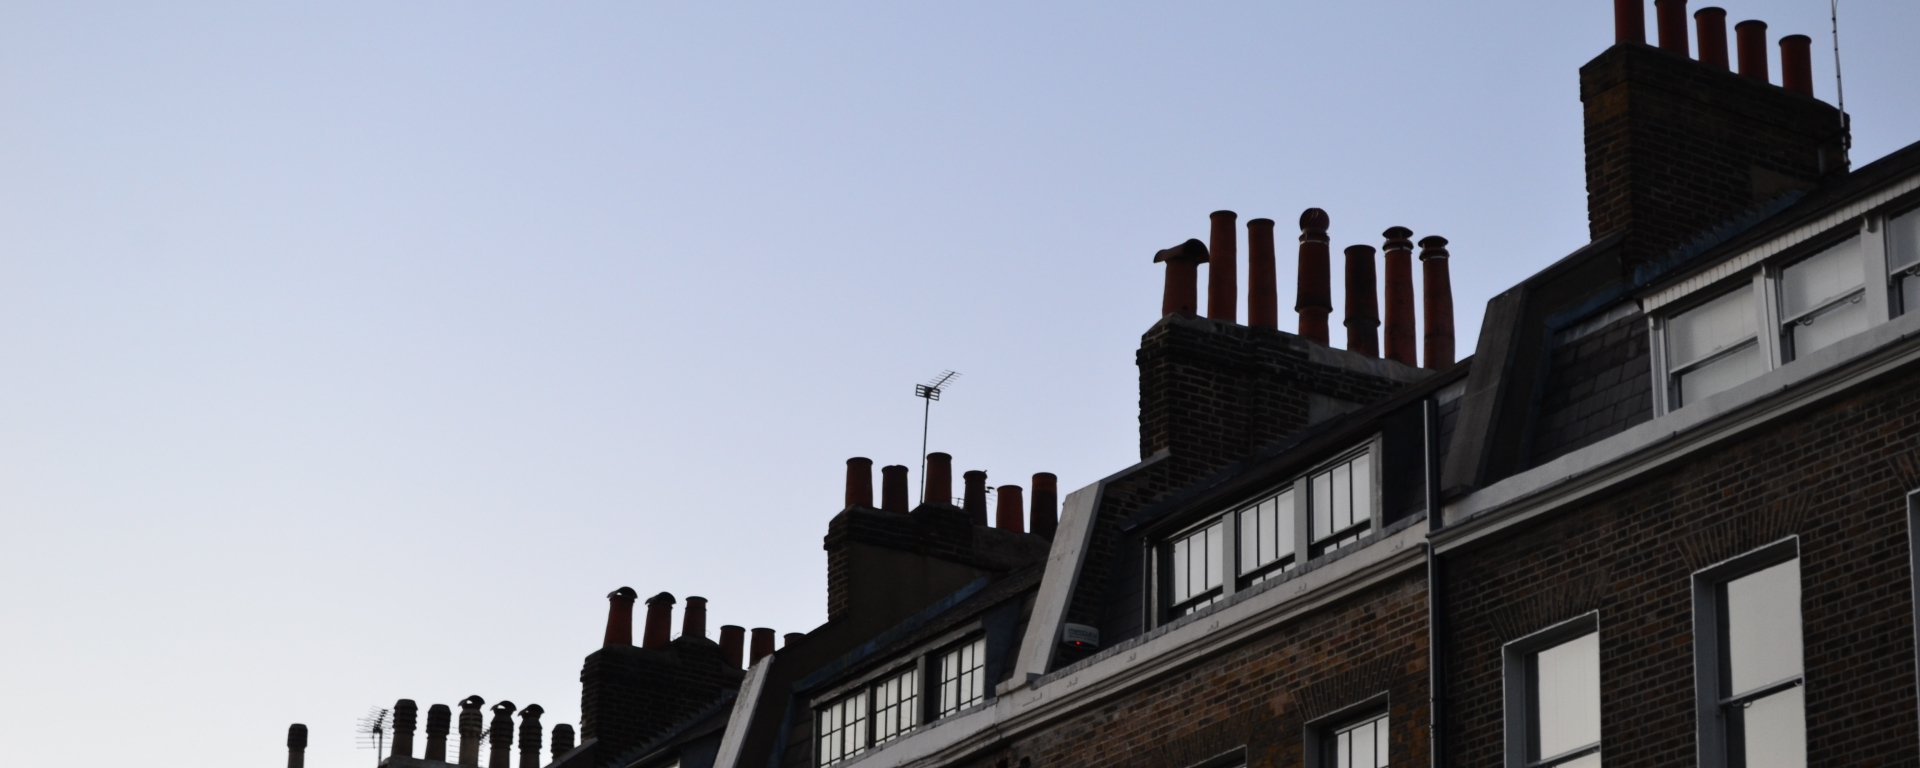 Beautiful Georgian chimneys at sunset, on Doughty Street, Bloomsbury